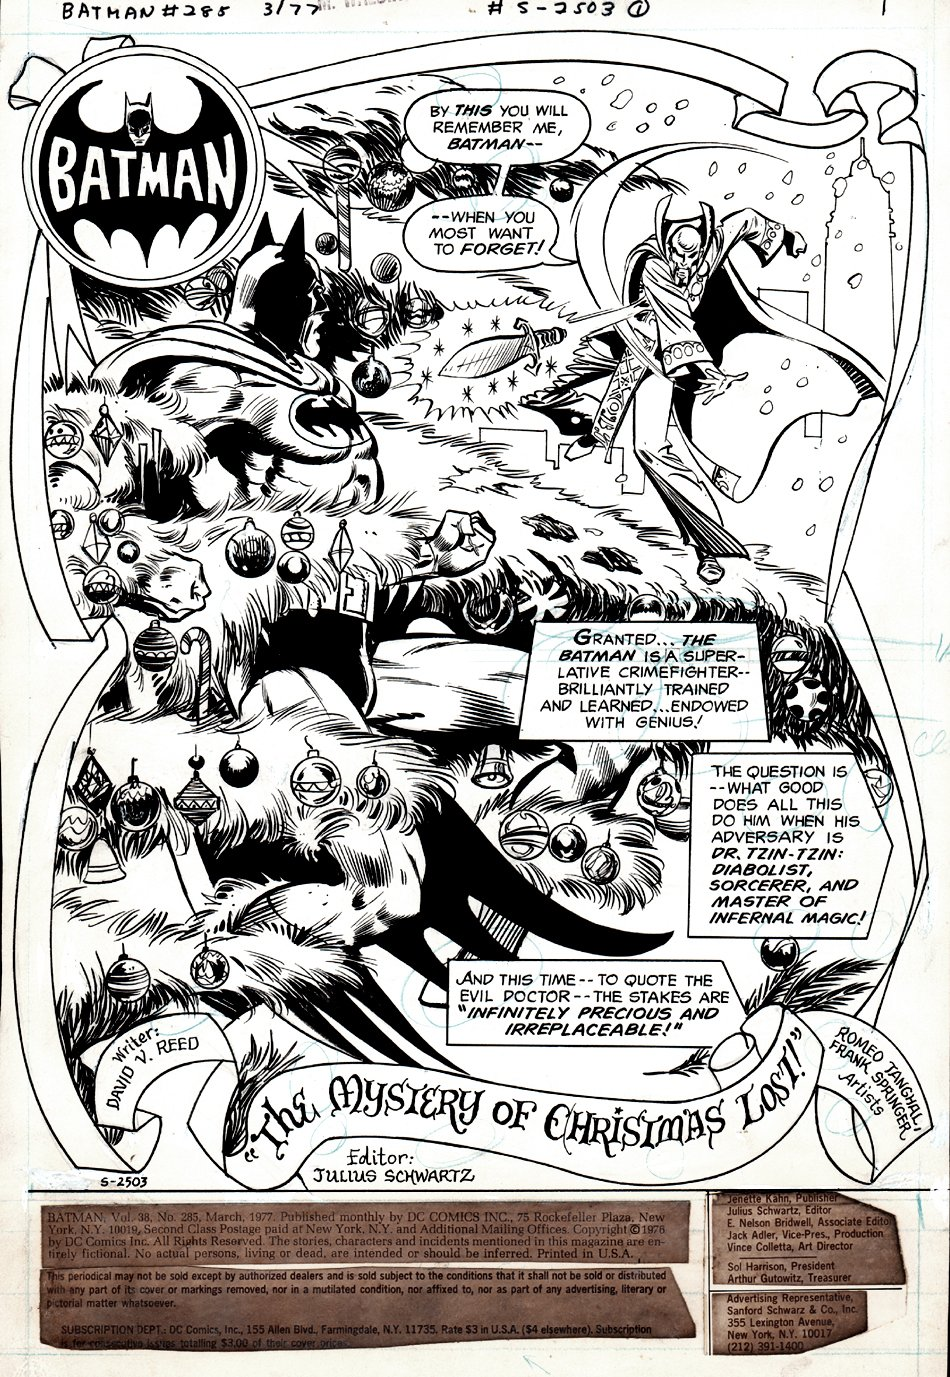 Batman #285 p 1 SPLASH (GREAT CHRISTMAS THEMED BATMAN BATTLE SPLASH!) 1976